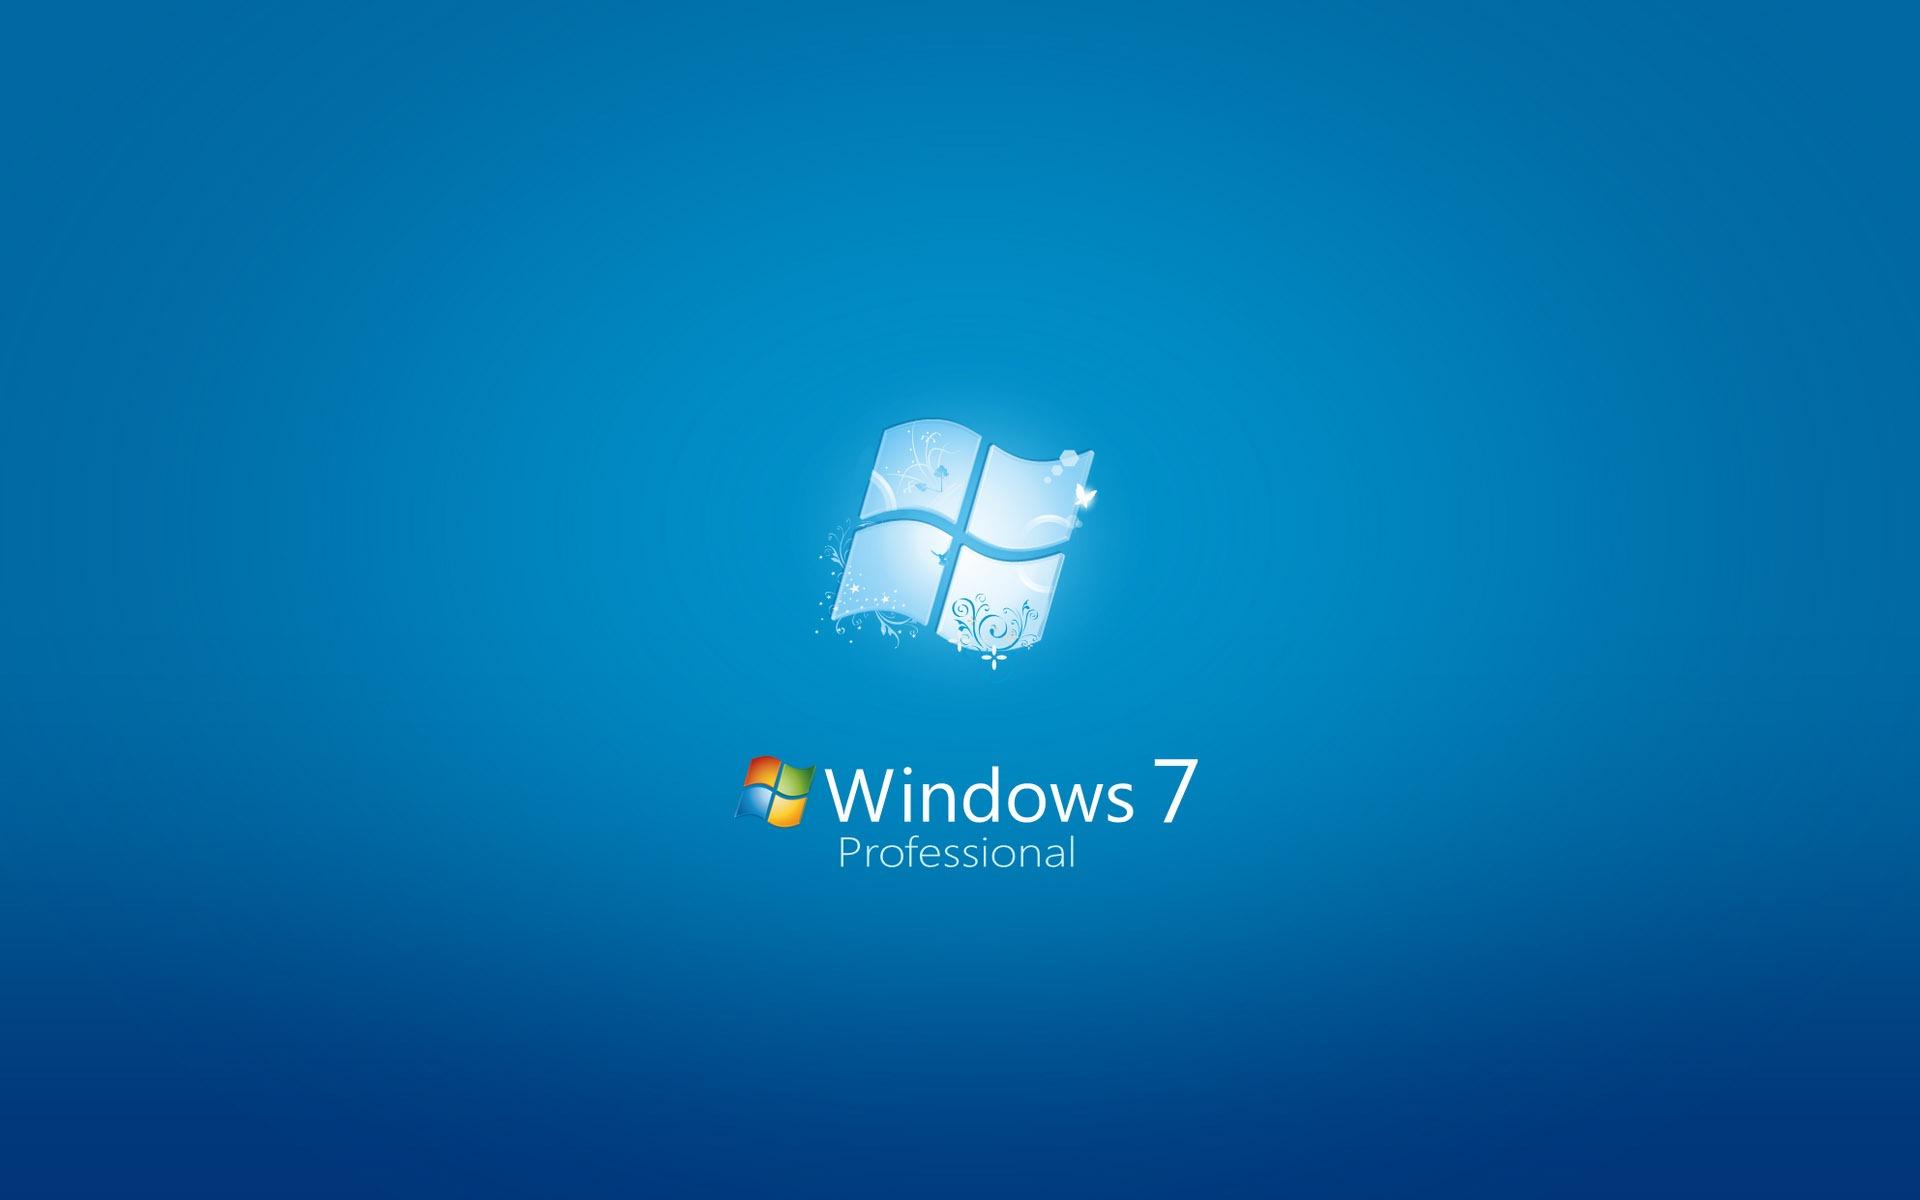 Windows7のテーマの壁紙 2 19 19x10 壁紙ダウンロード Windows7のテーマの壁紙 2 システム 壁紙 V3の壁紙